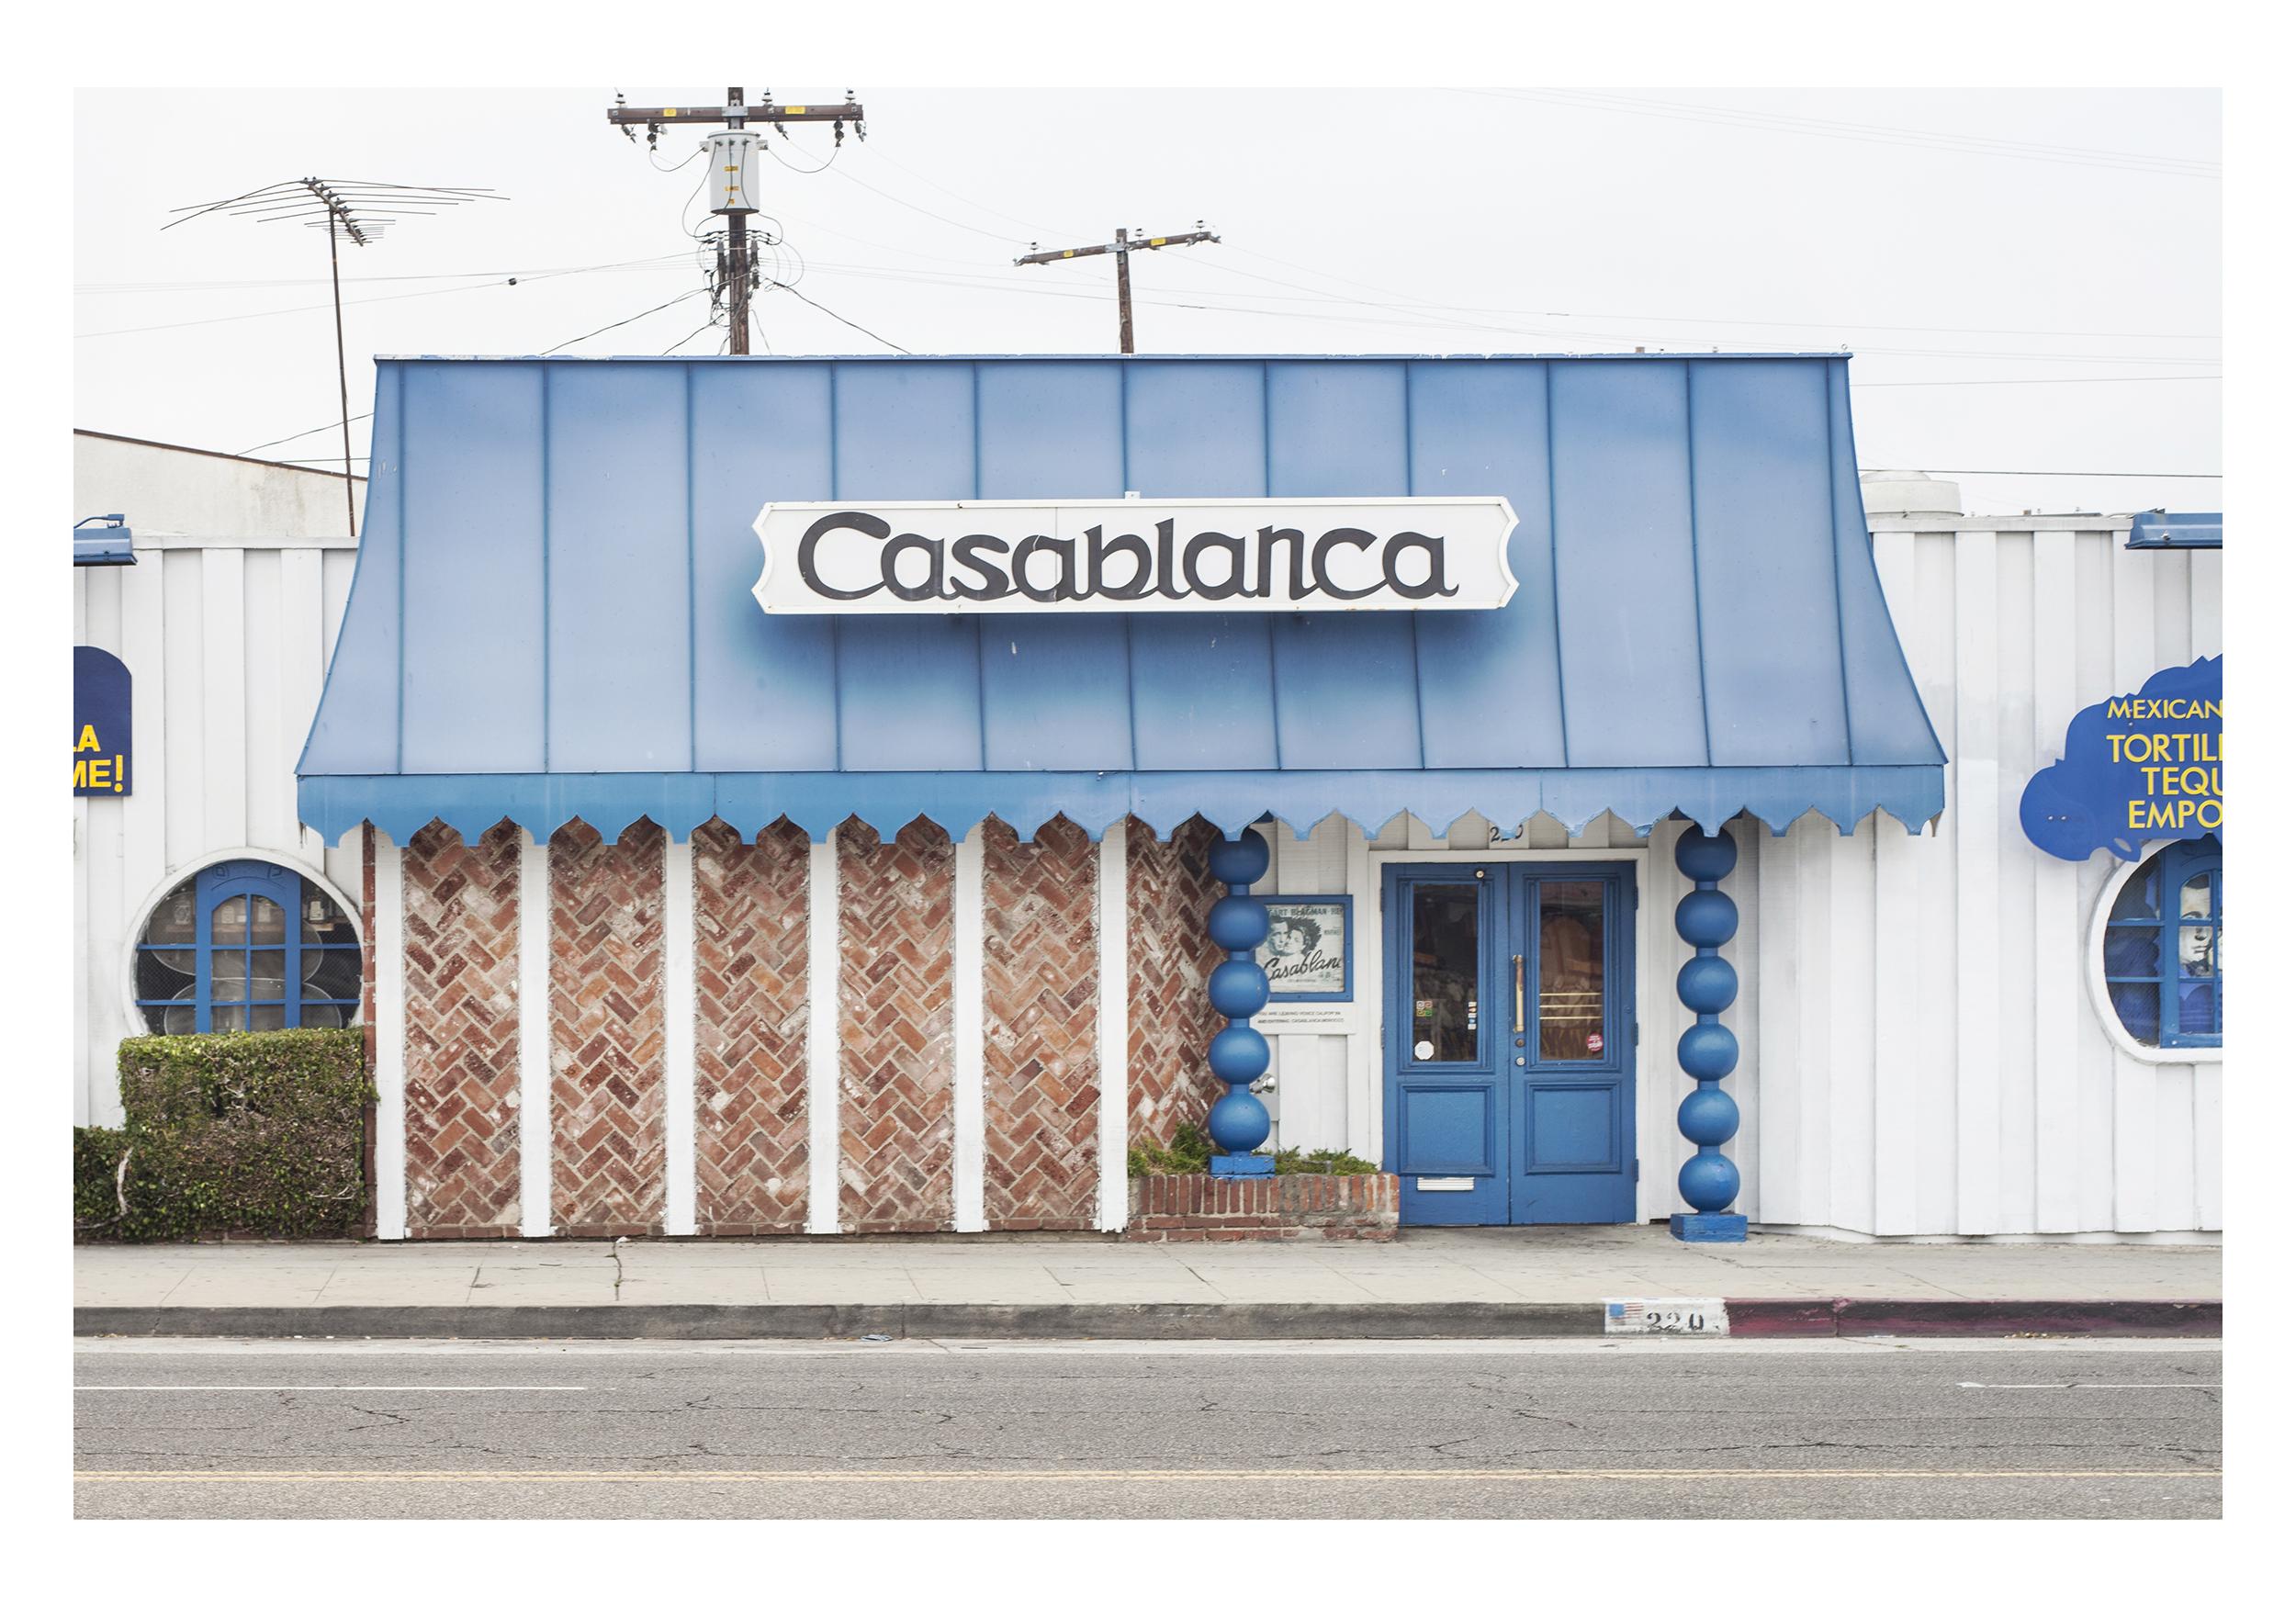 Casablanca Venice, California 2016